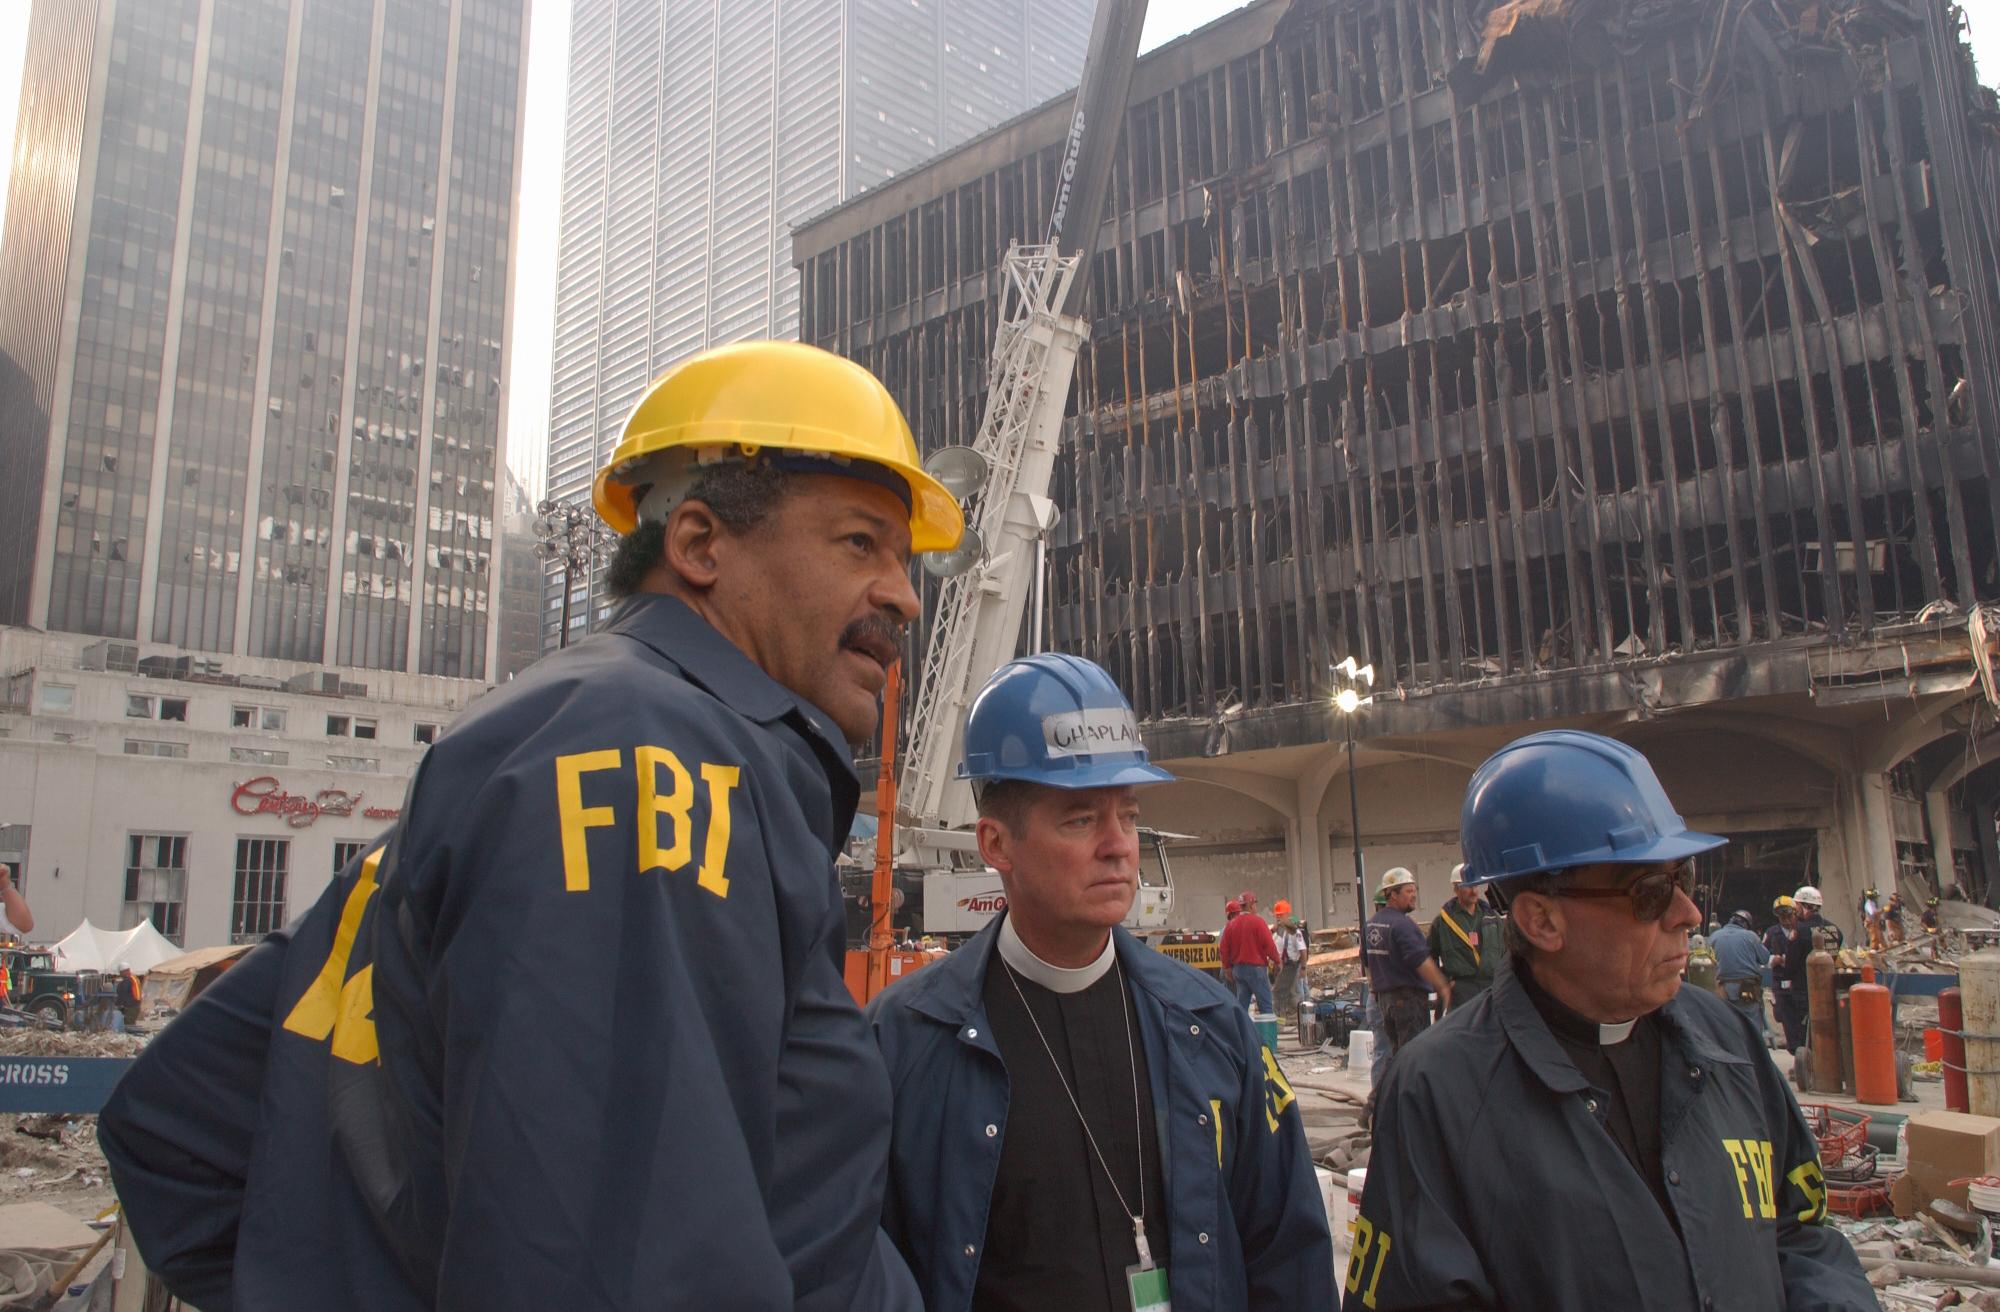 FBI Chaplains — FBI